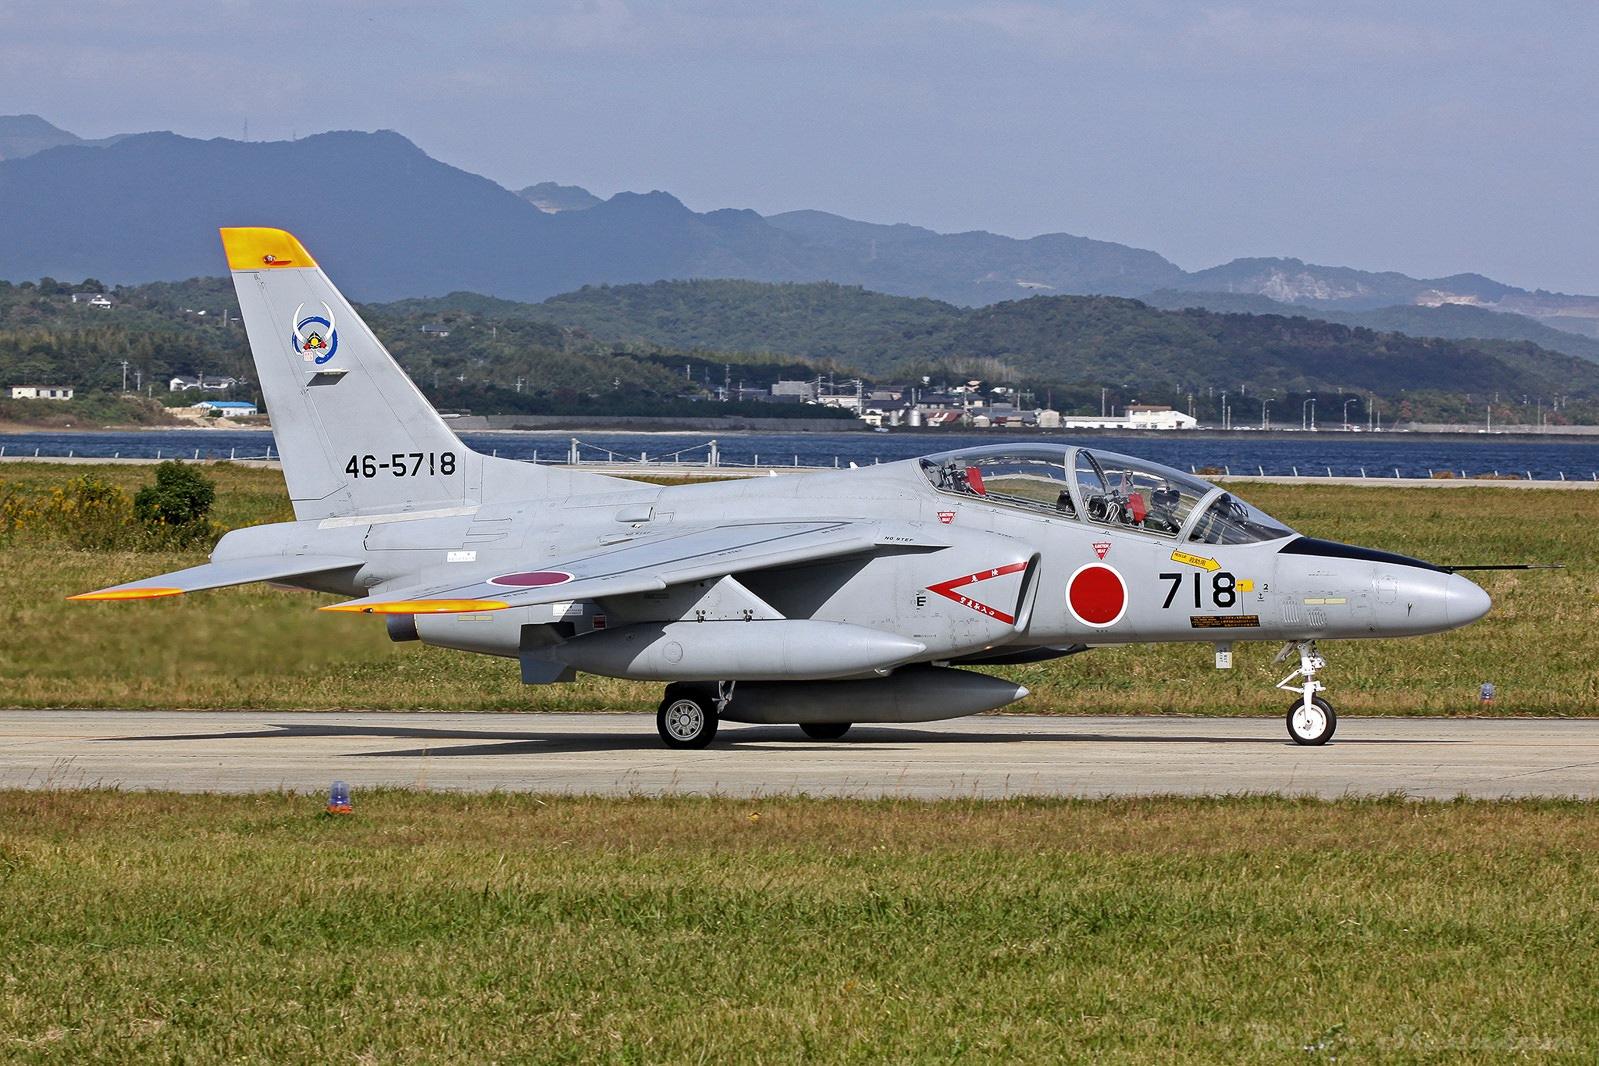 t-4-46-5718-base-flight-taxiing_mod_fb